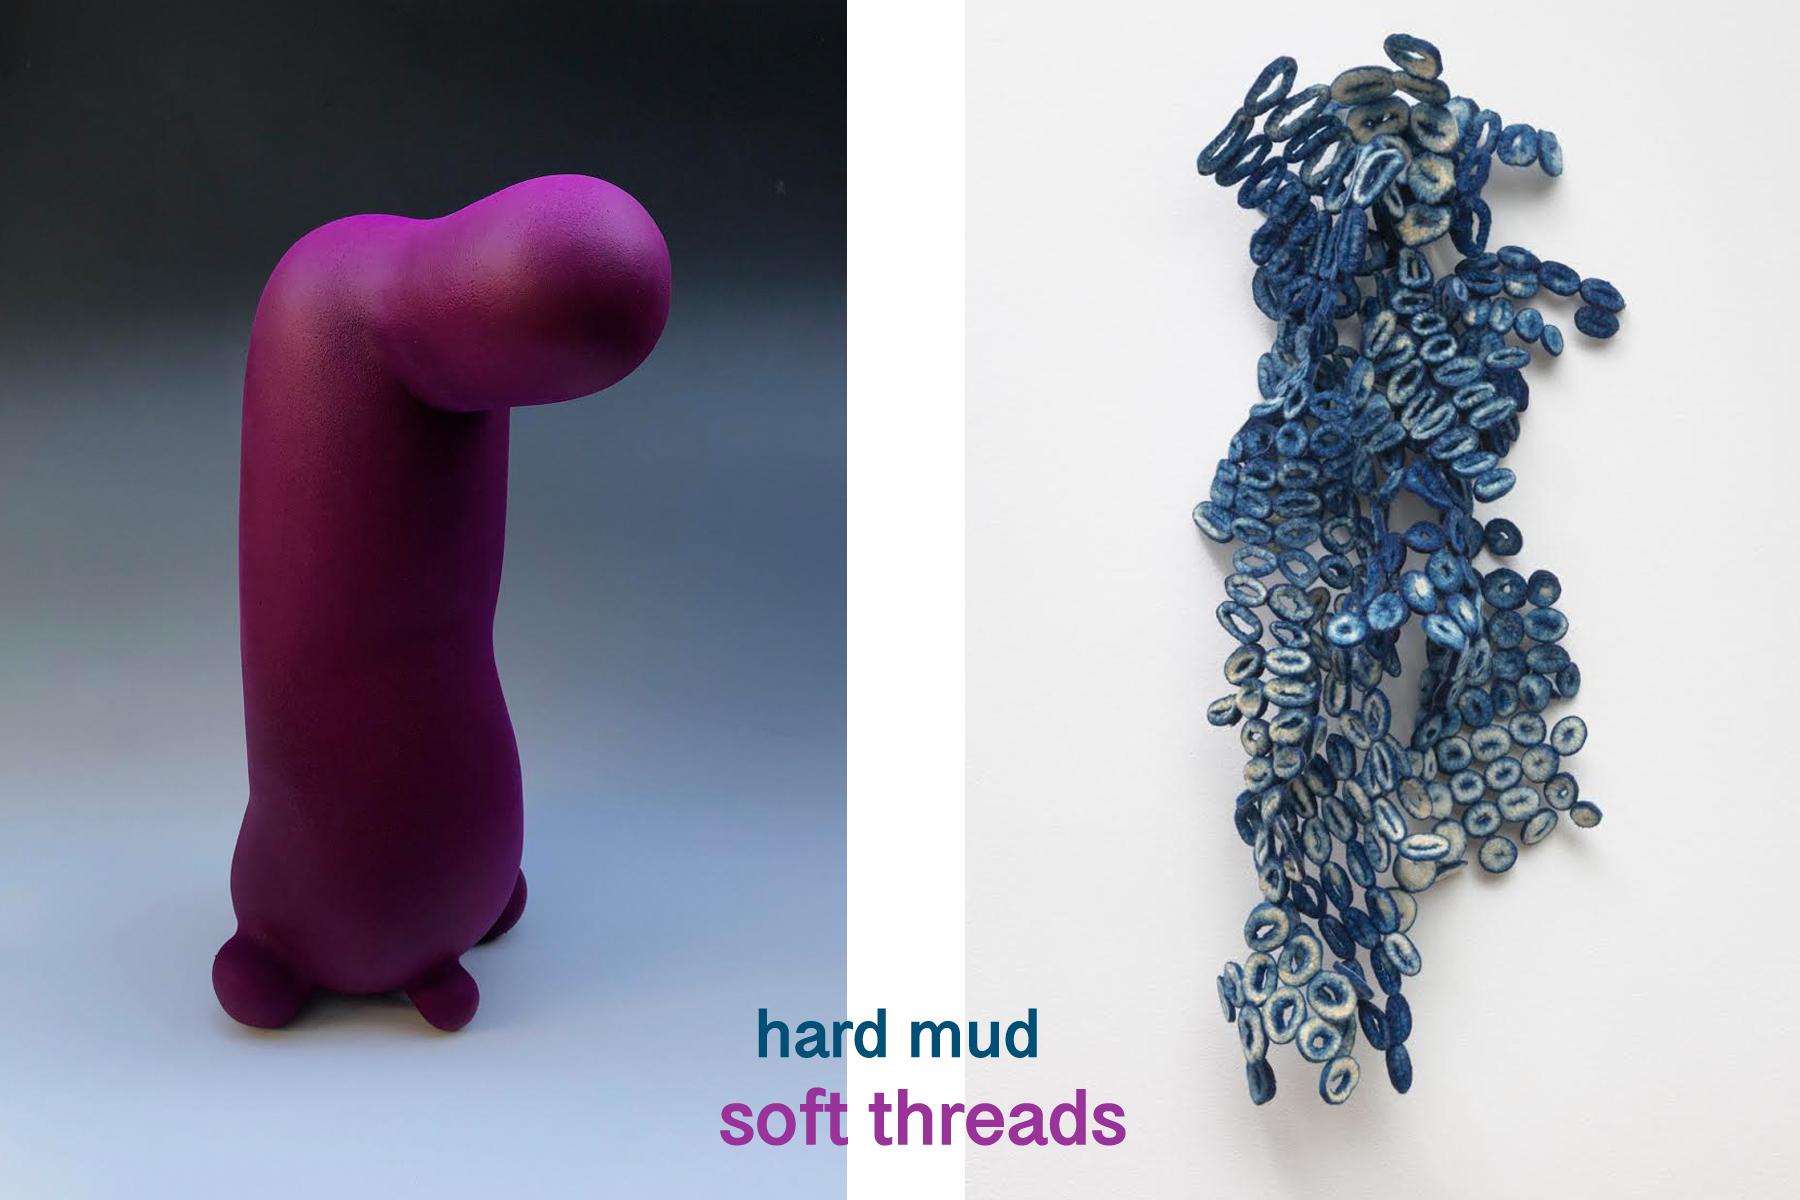 Hard mud soft threads postcard front.jpg